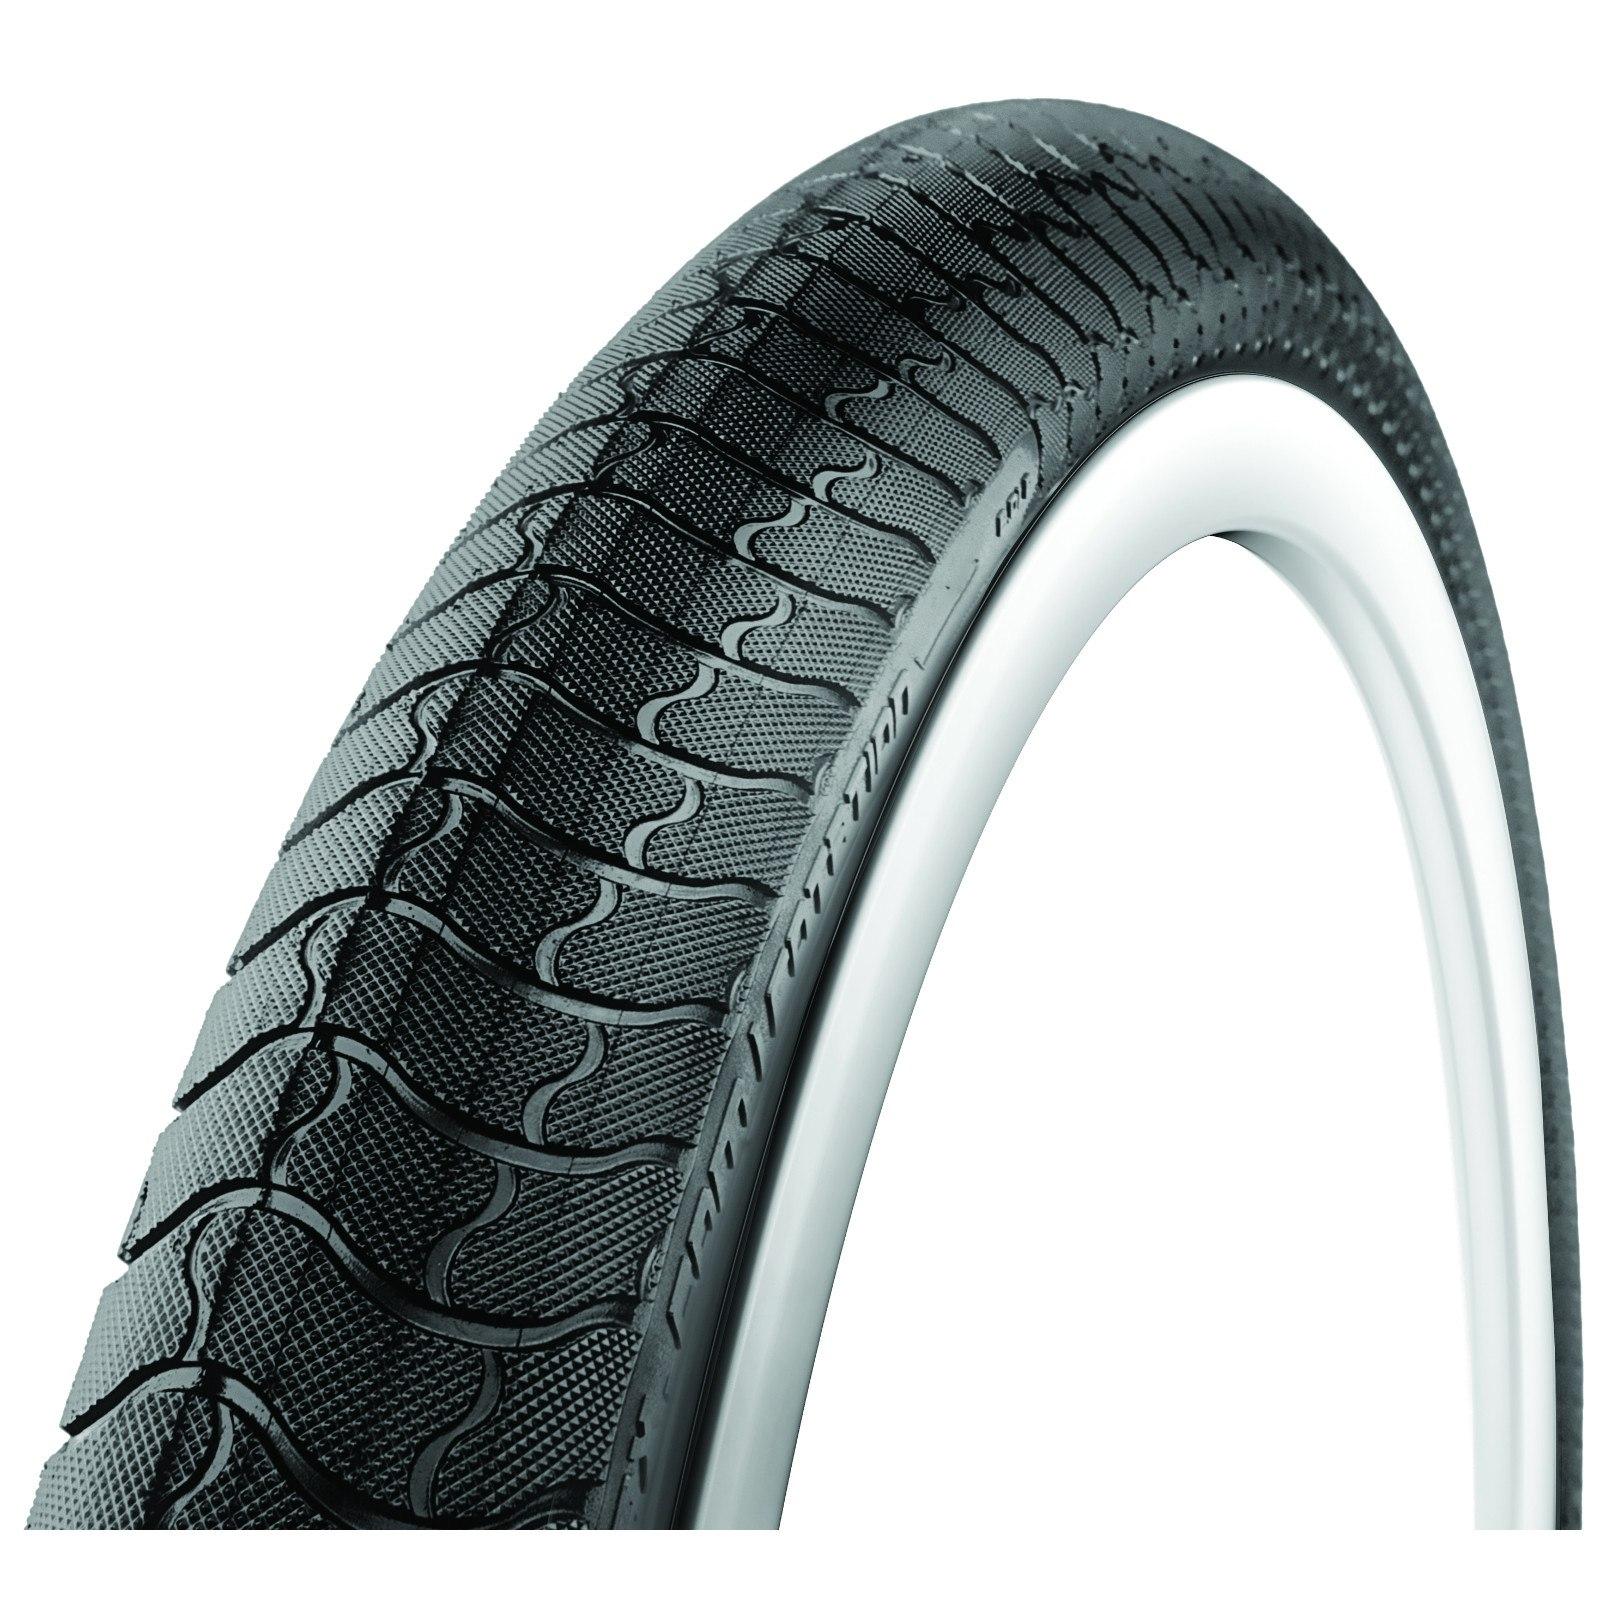 Image of Vittoria Tattoo Light MTB Wire Bead Tire - 29x2.3 Inches - black - ETRTO 56-622